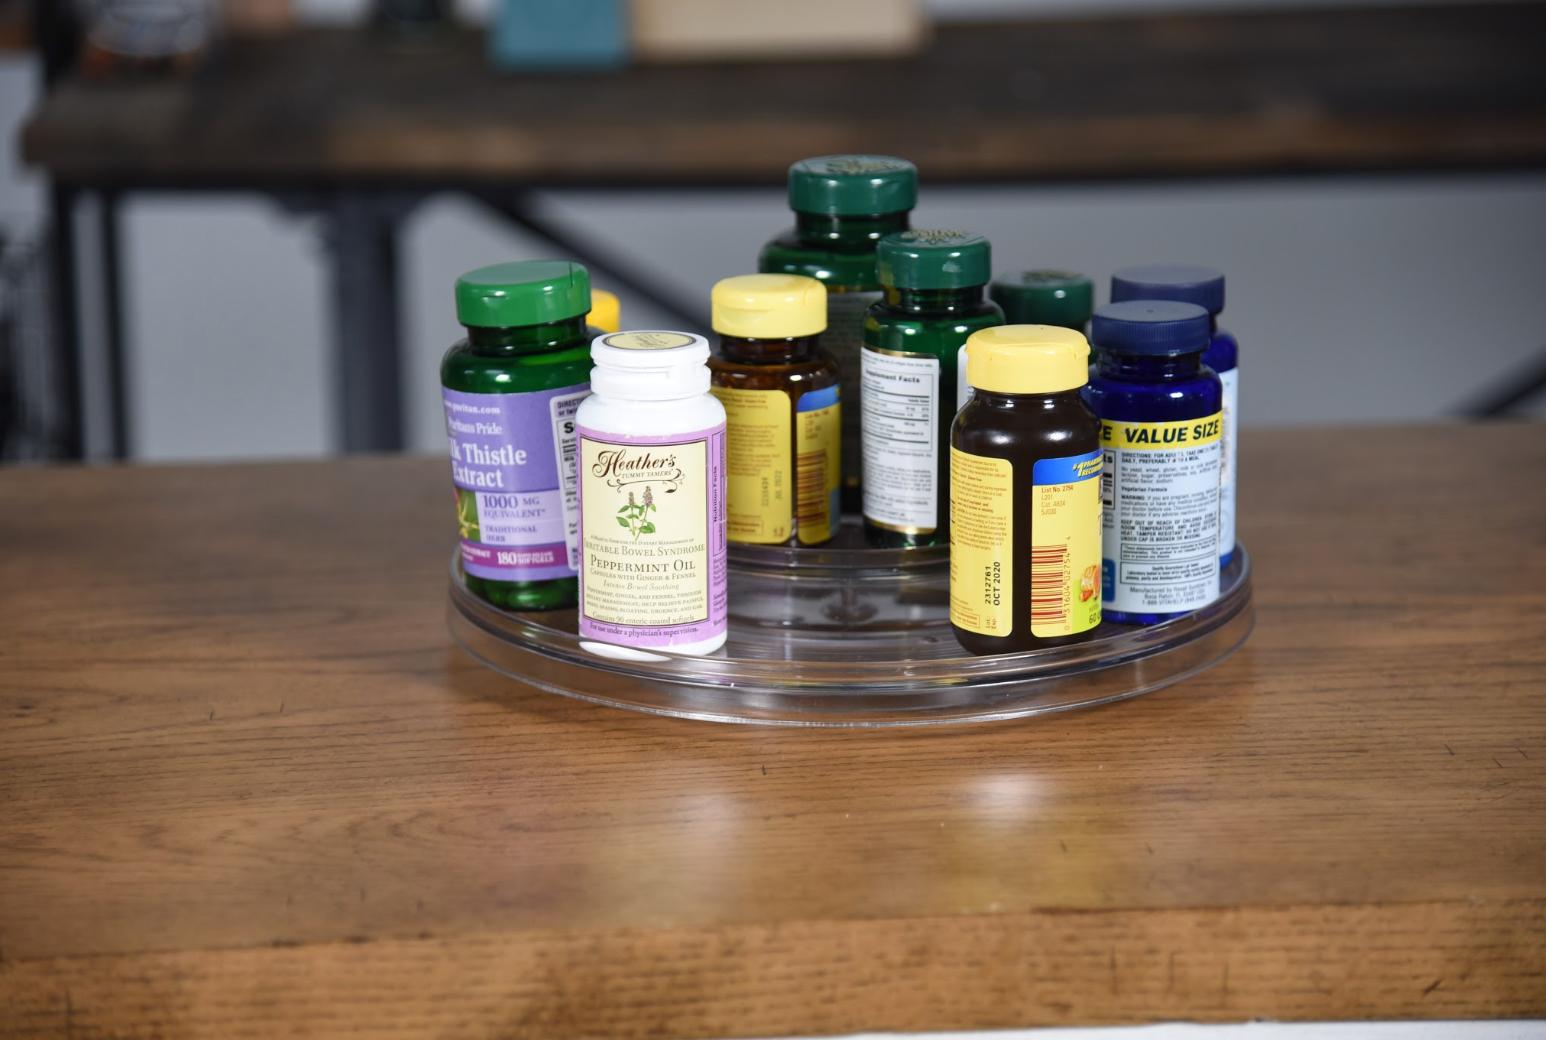 vitamins in a lazy susan